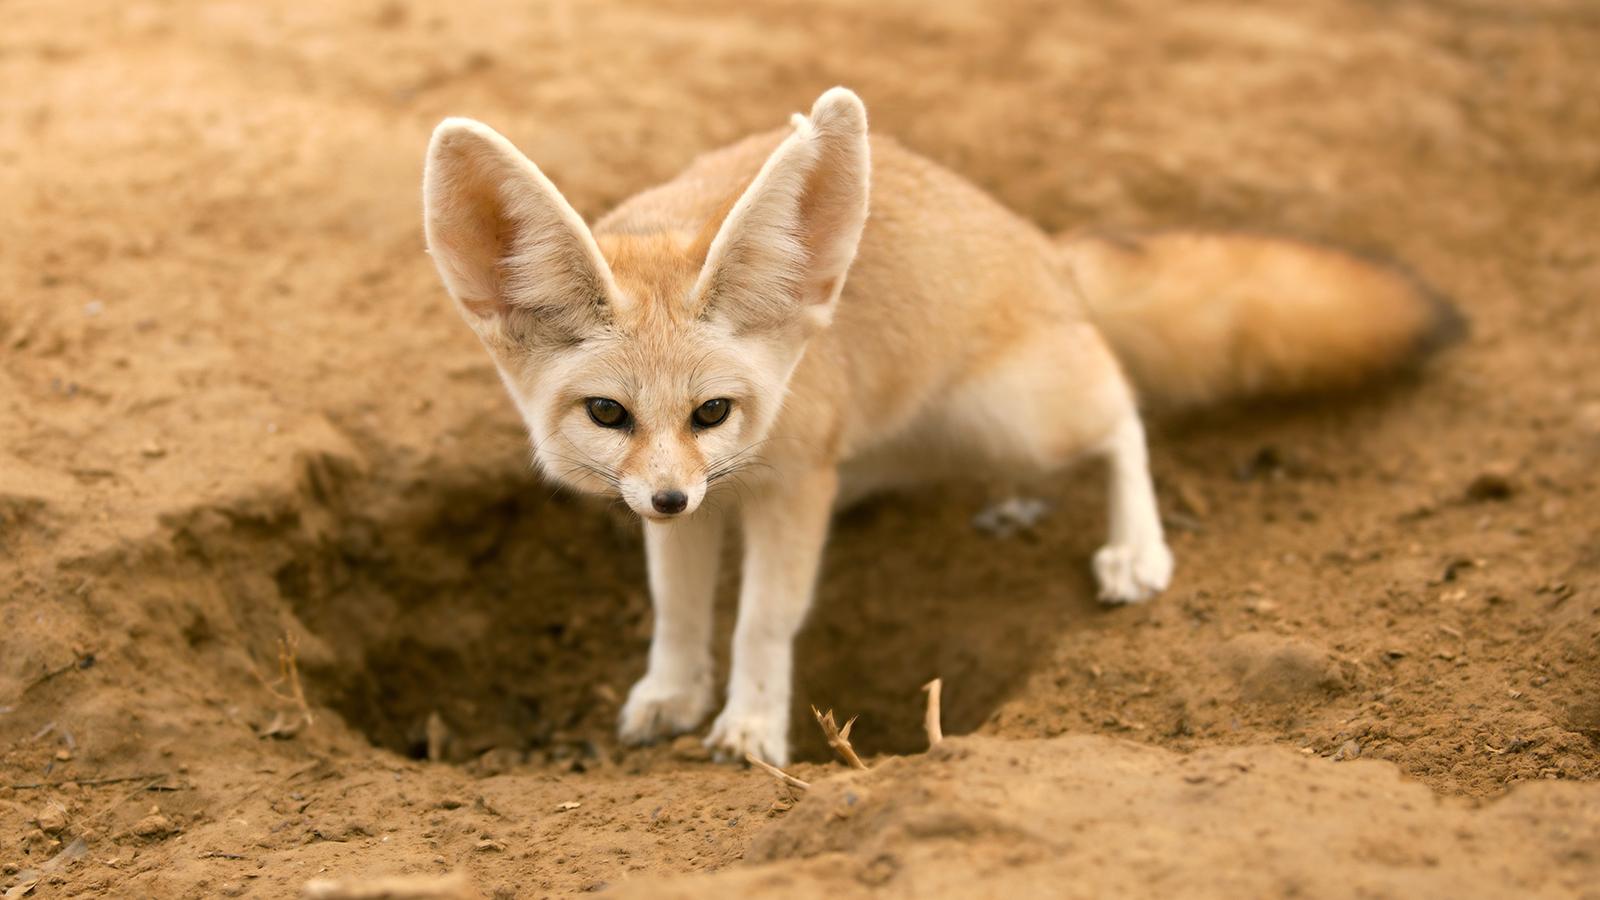 Fennec Fox Pictures